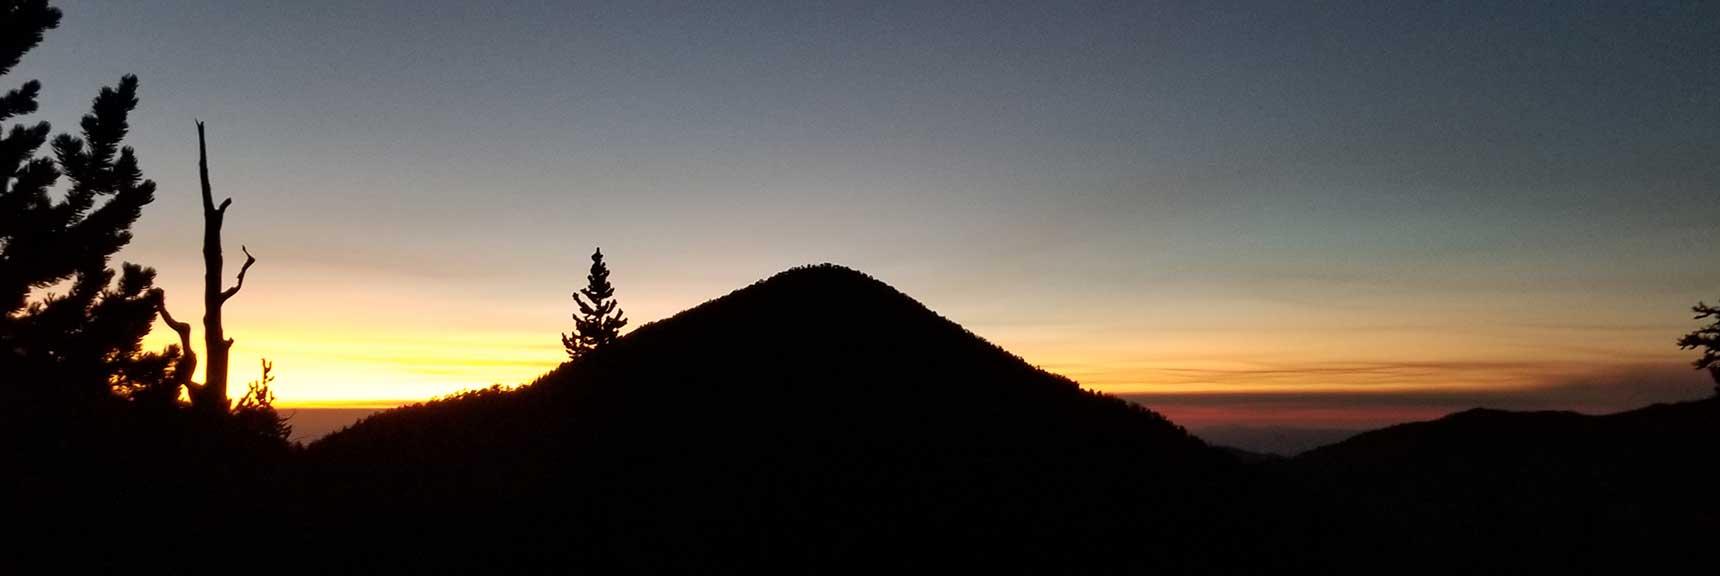 Six Peak Circuit Strategy Spring Mountains Nevada 001